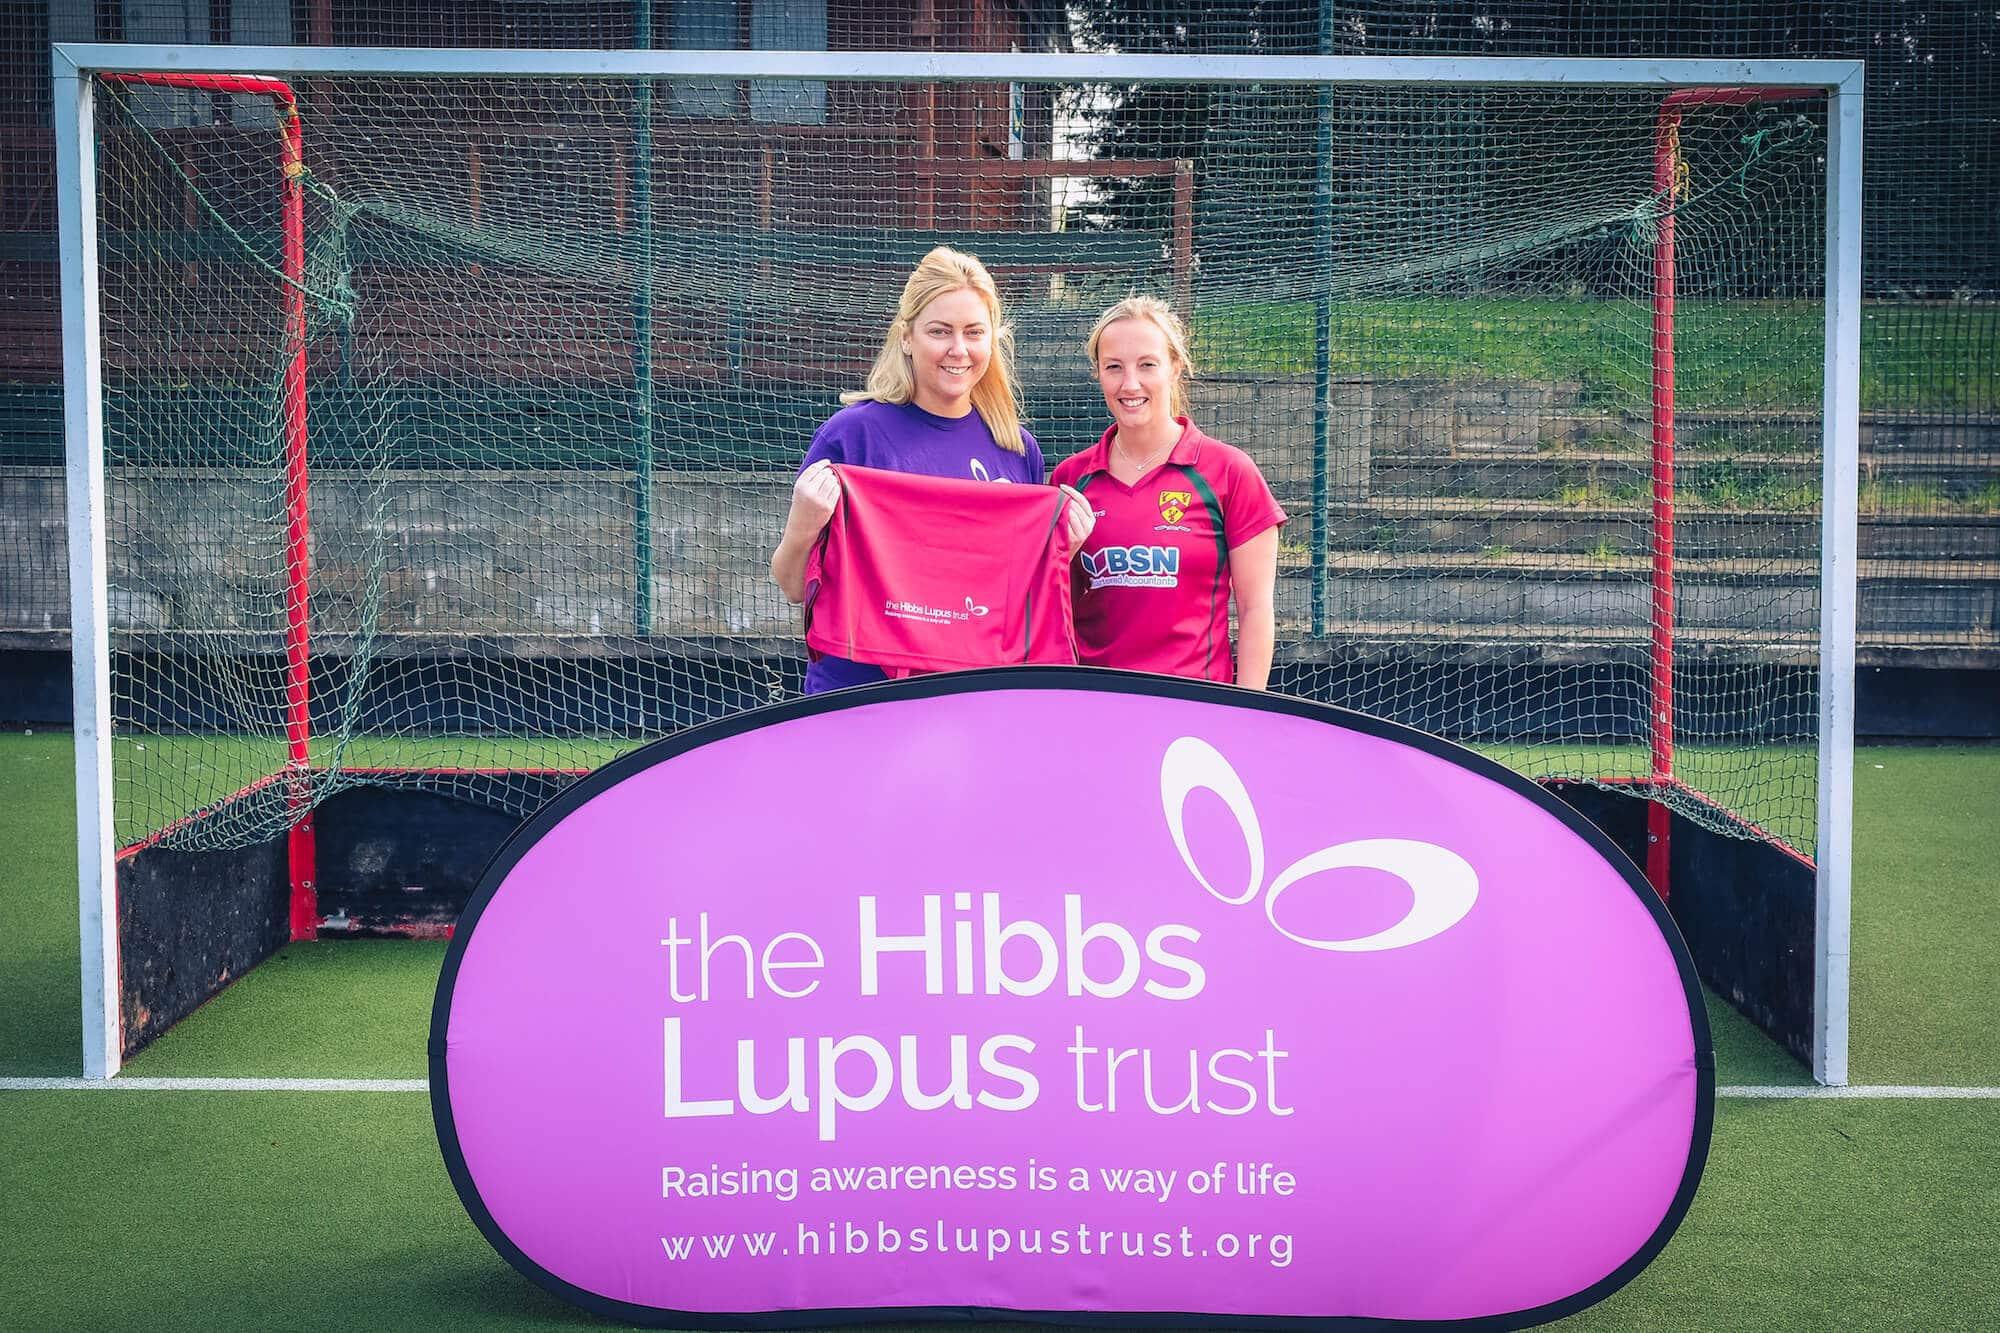 The Hibbs Lupus Trust and Cannock Ladies Hockey Club